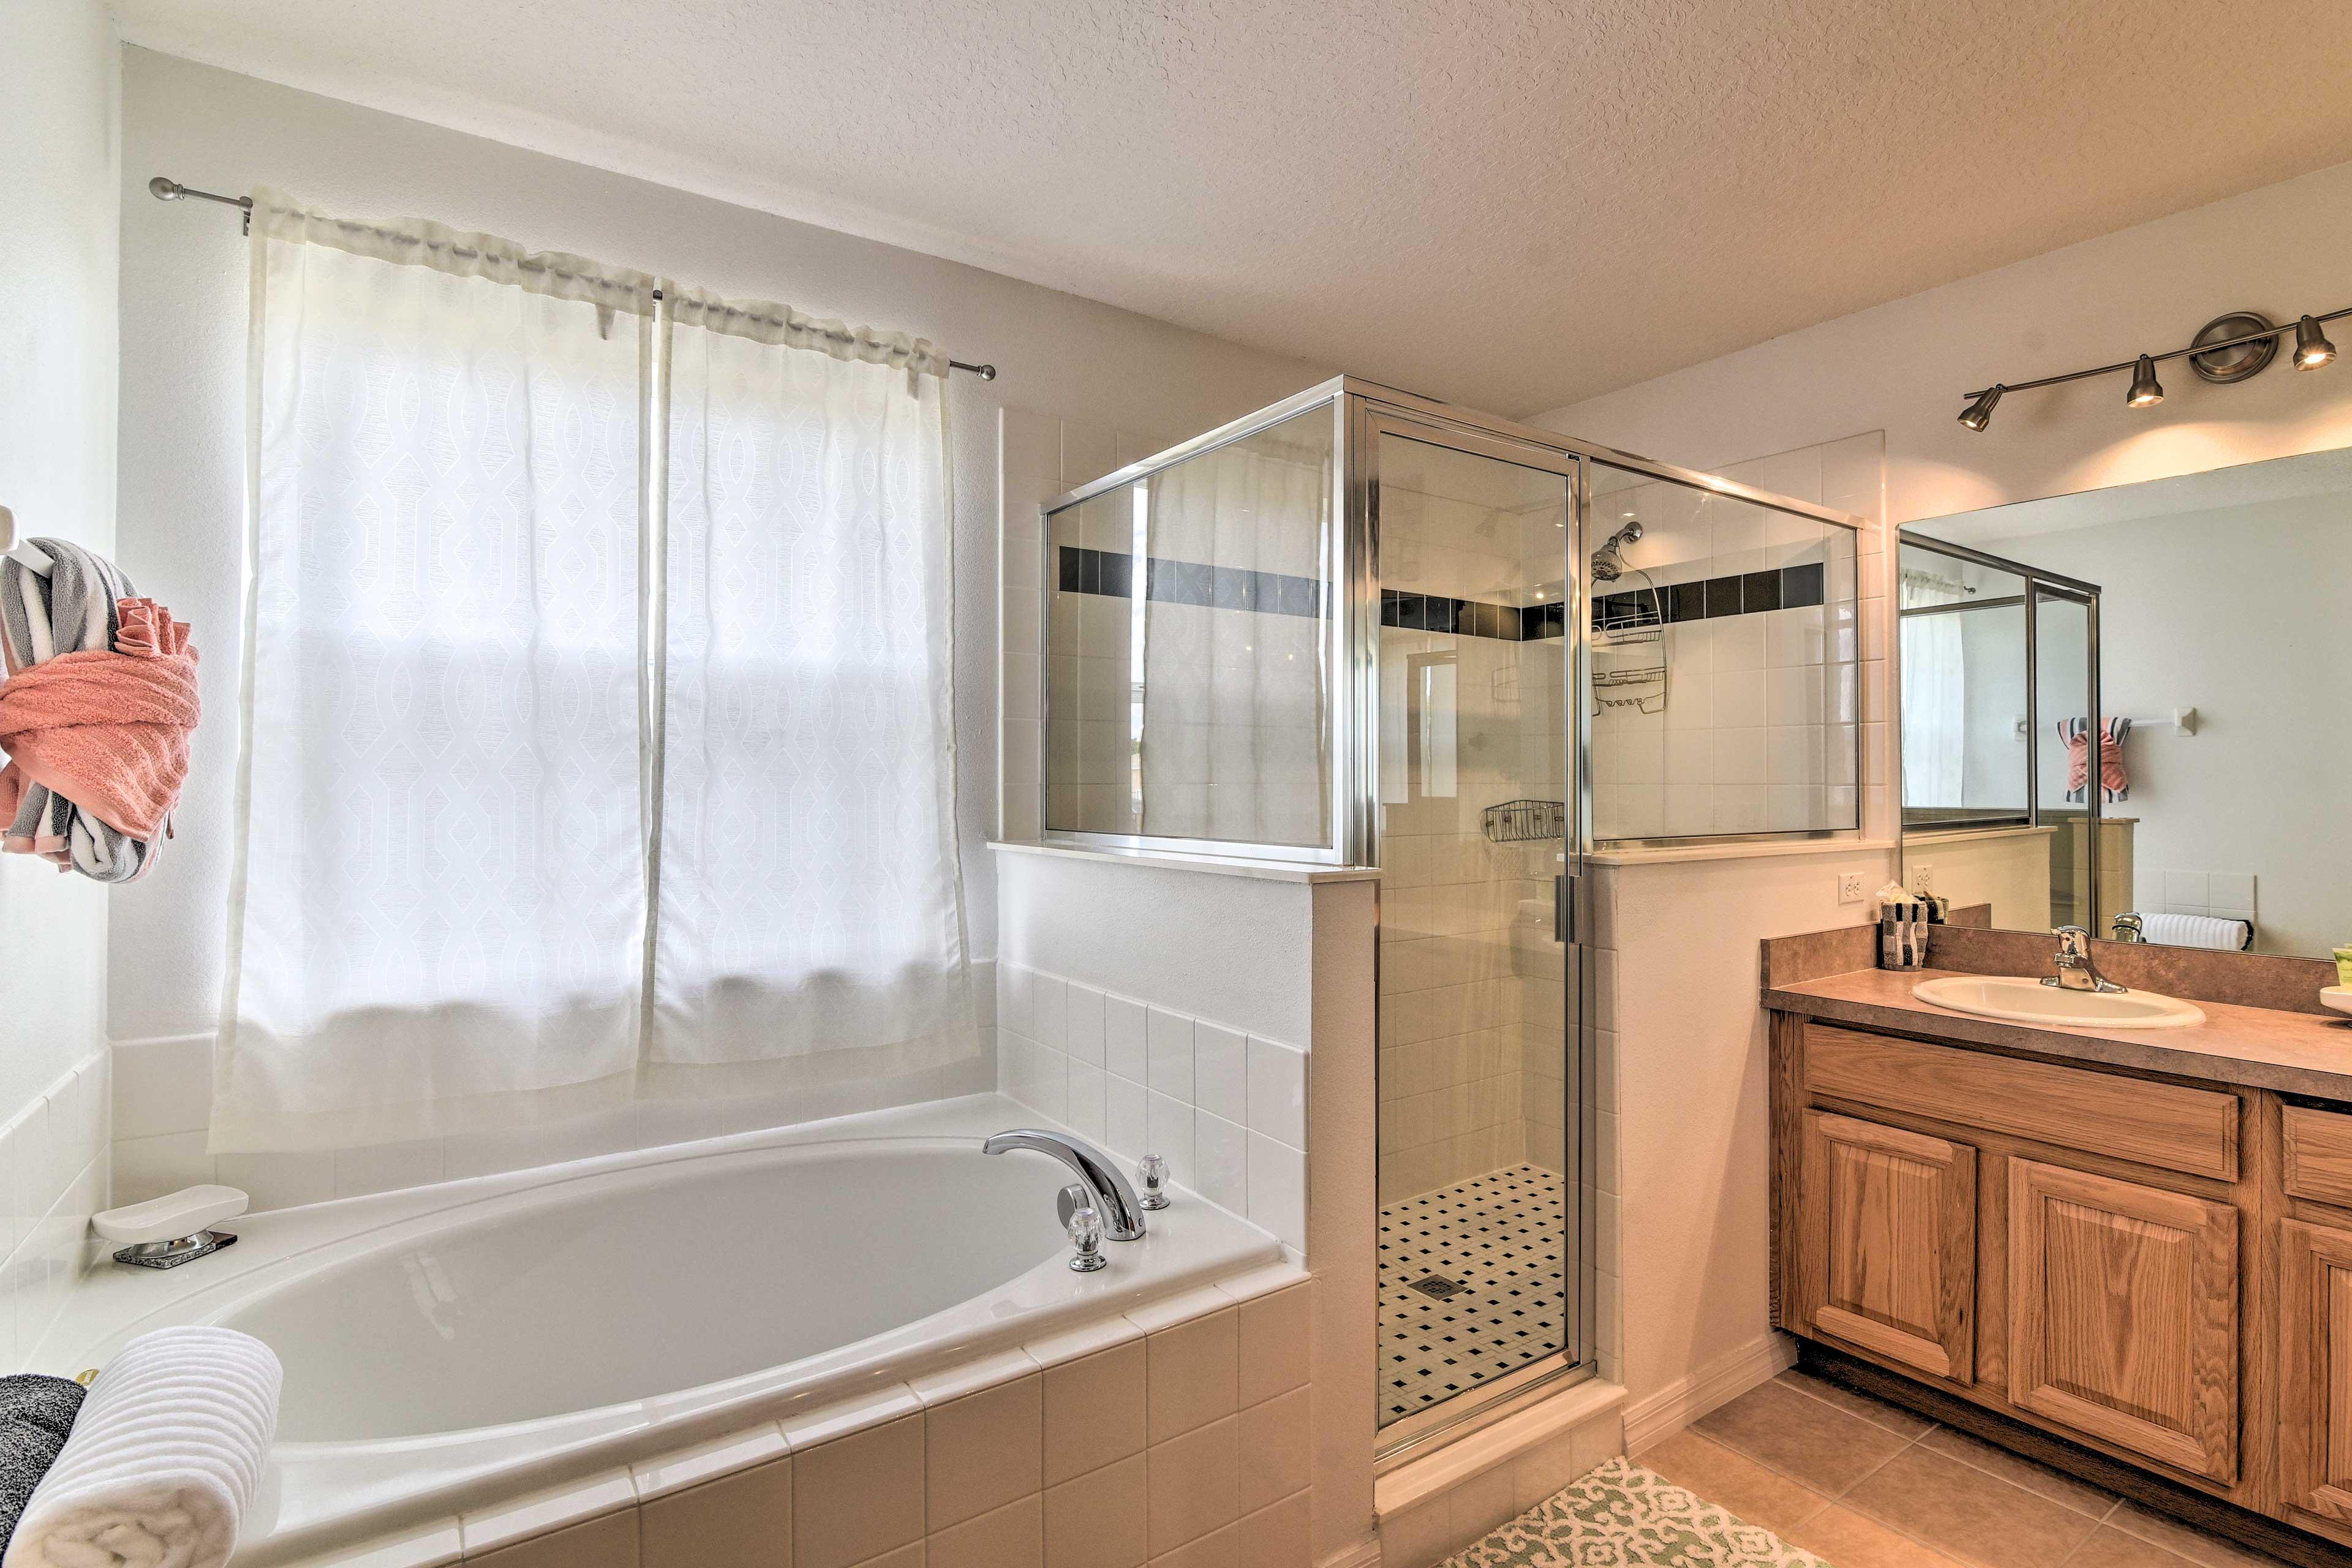 Take a relaxing soak in the large bathtub.